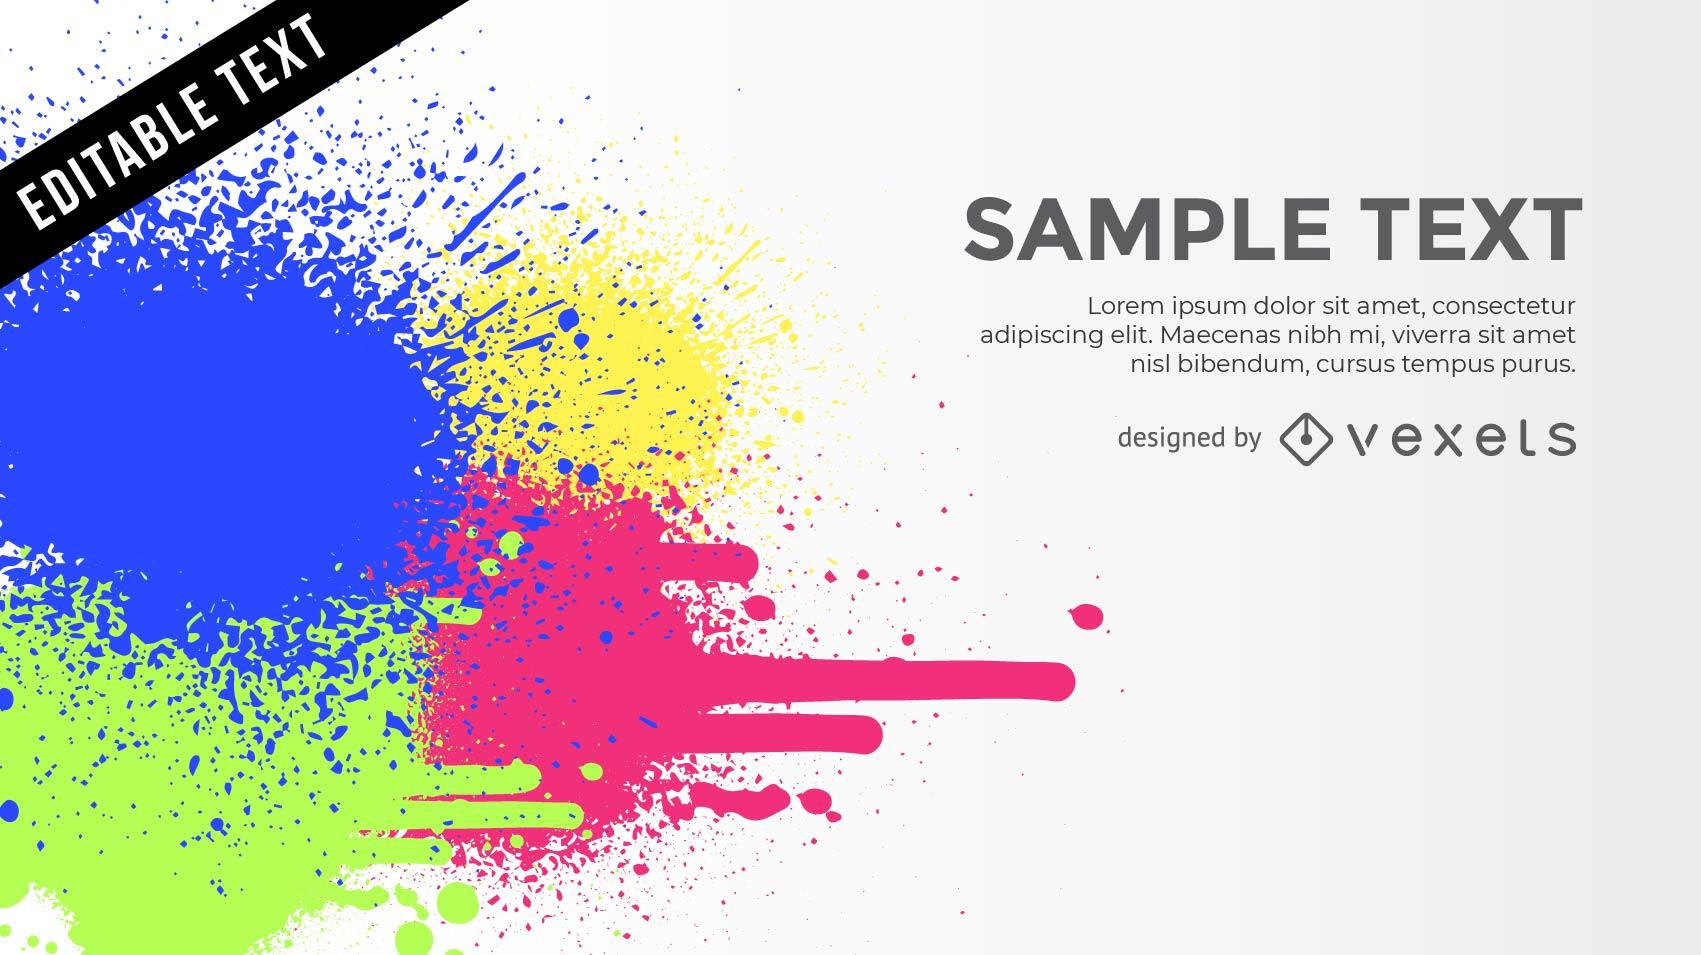 Fondo de salpicaduras de color con texto